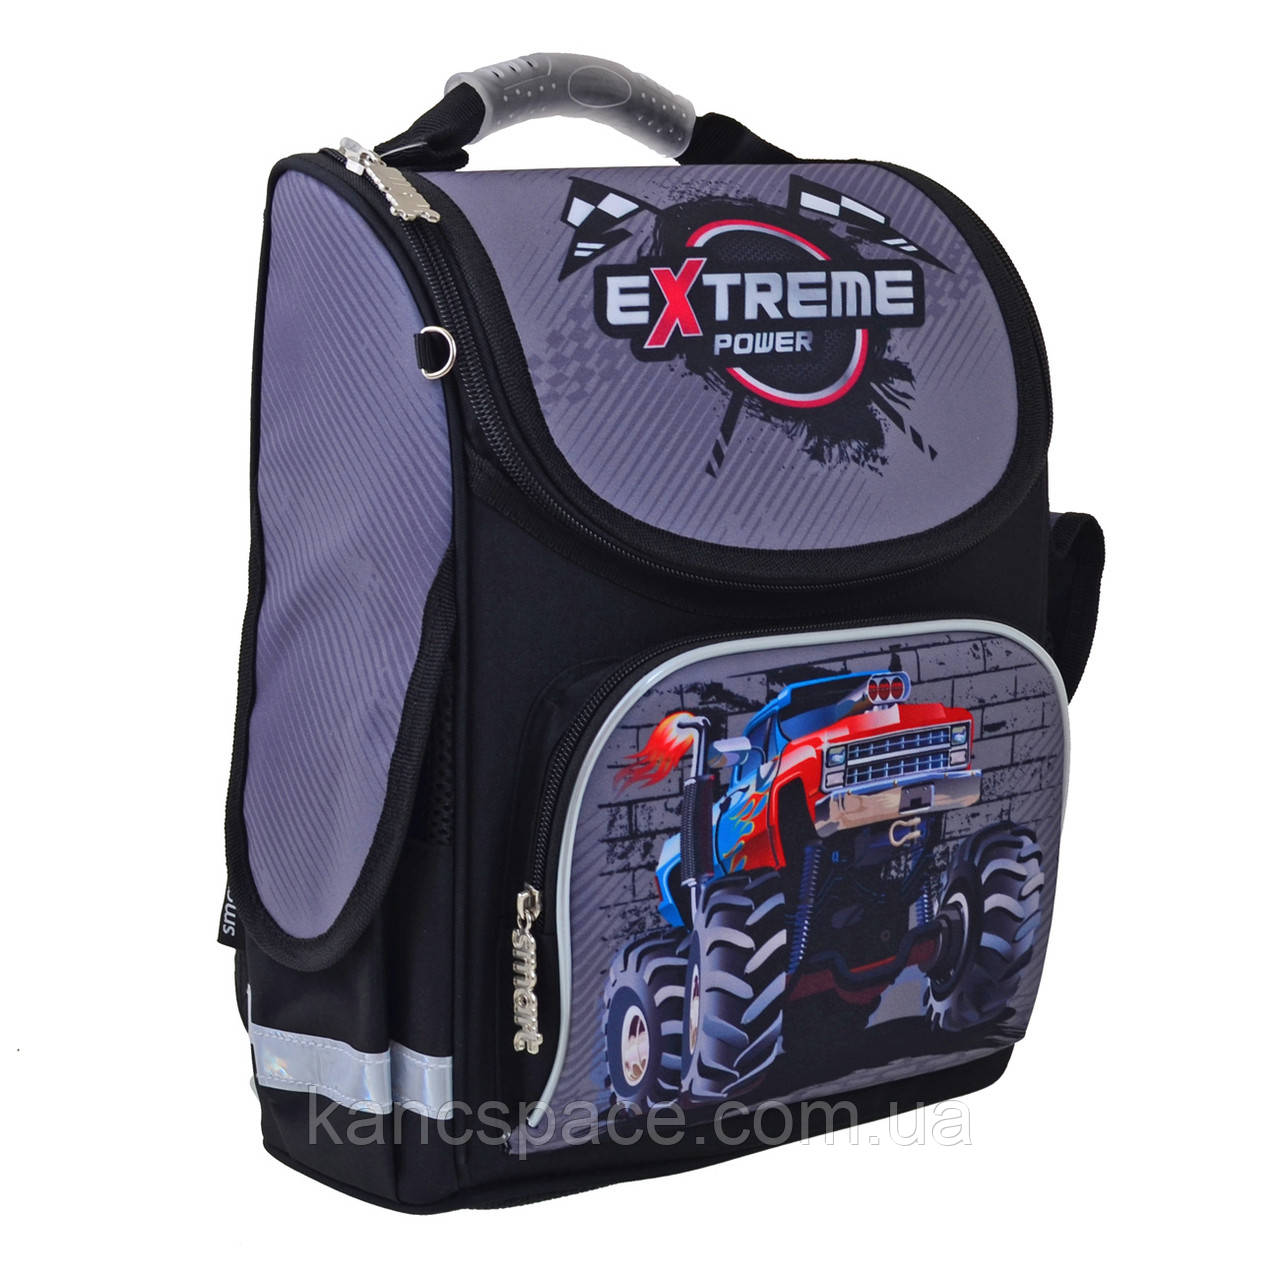 Рюкзак каркасний PG-11 Extreme power, 34*26*14